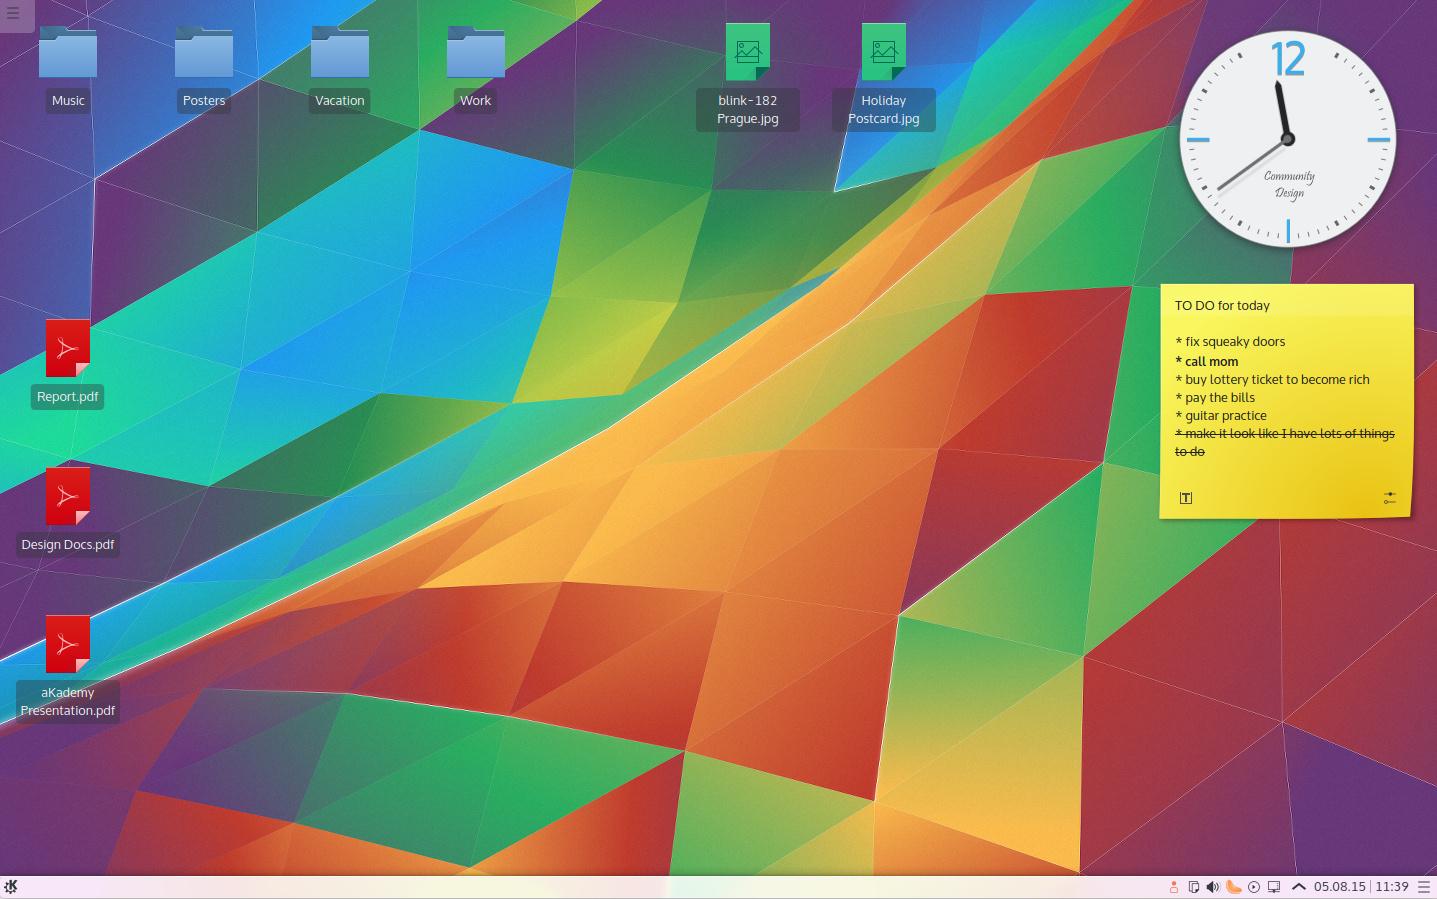 kubuntu.jpg